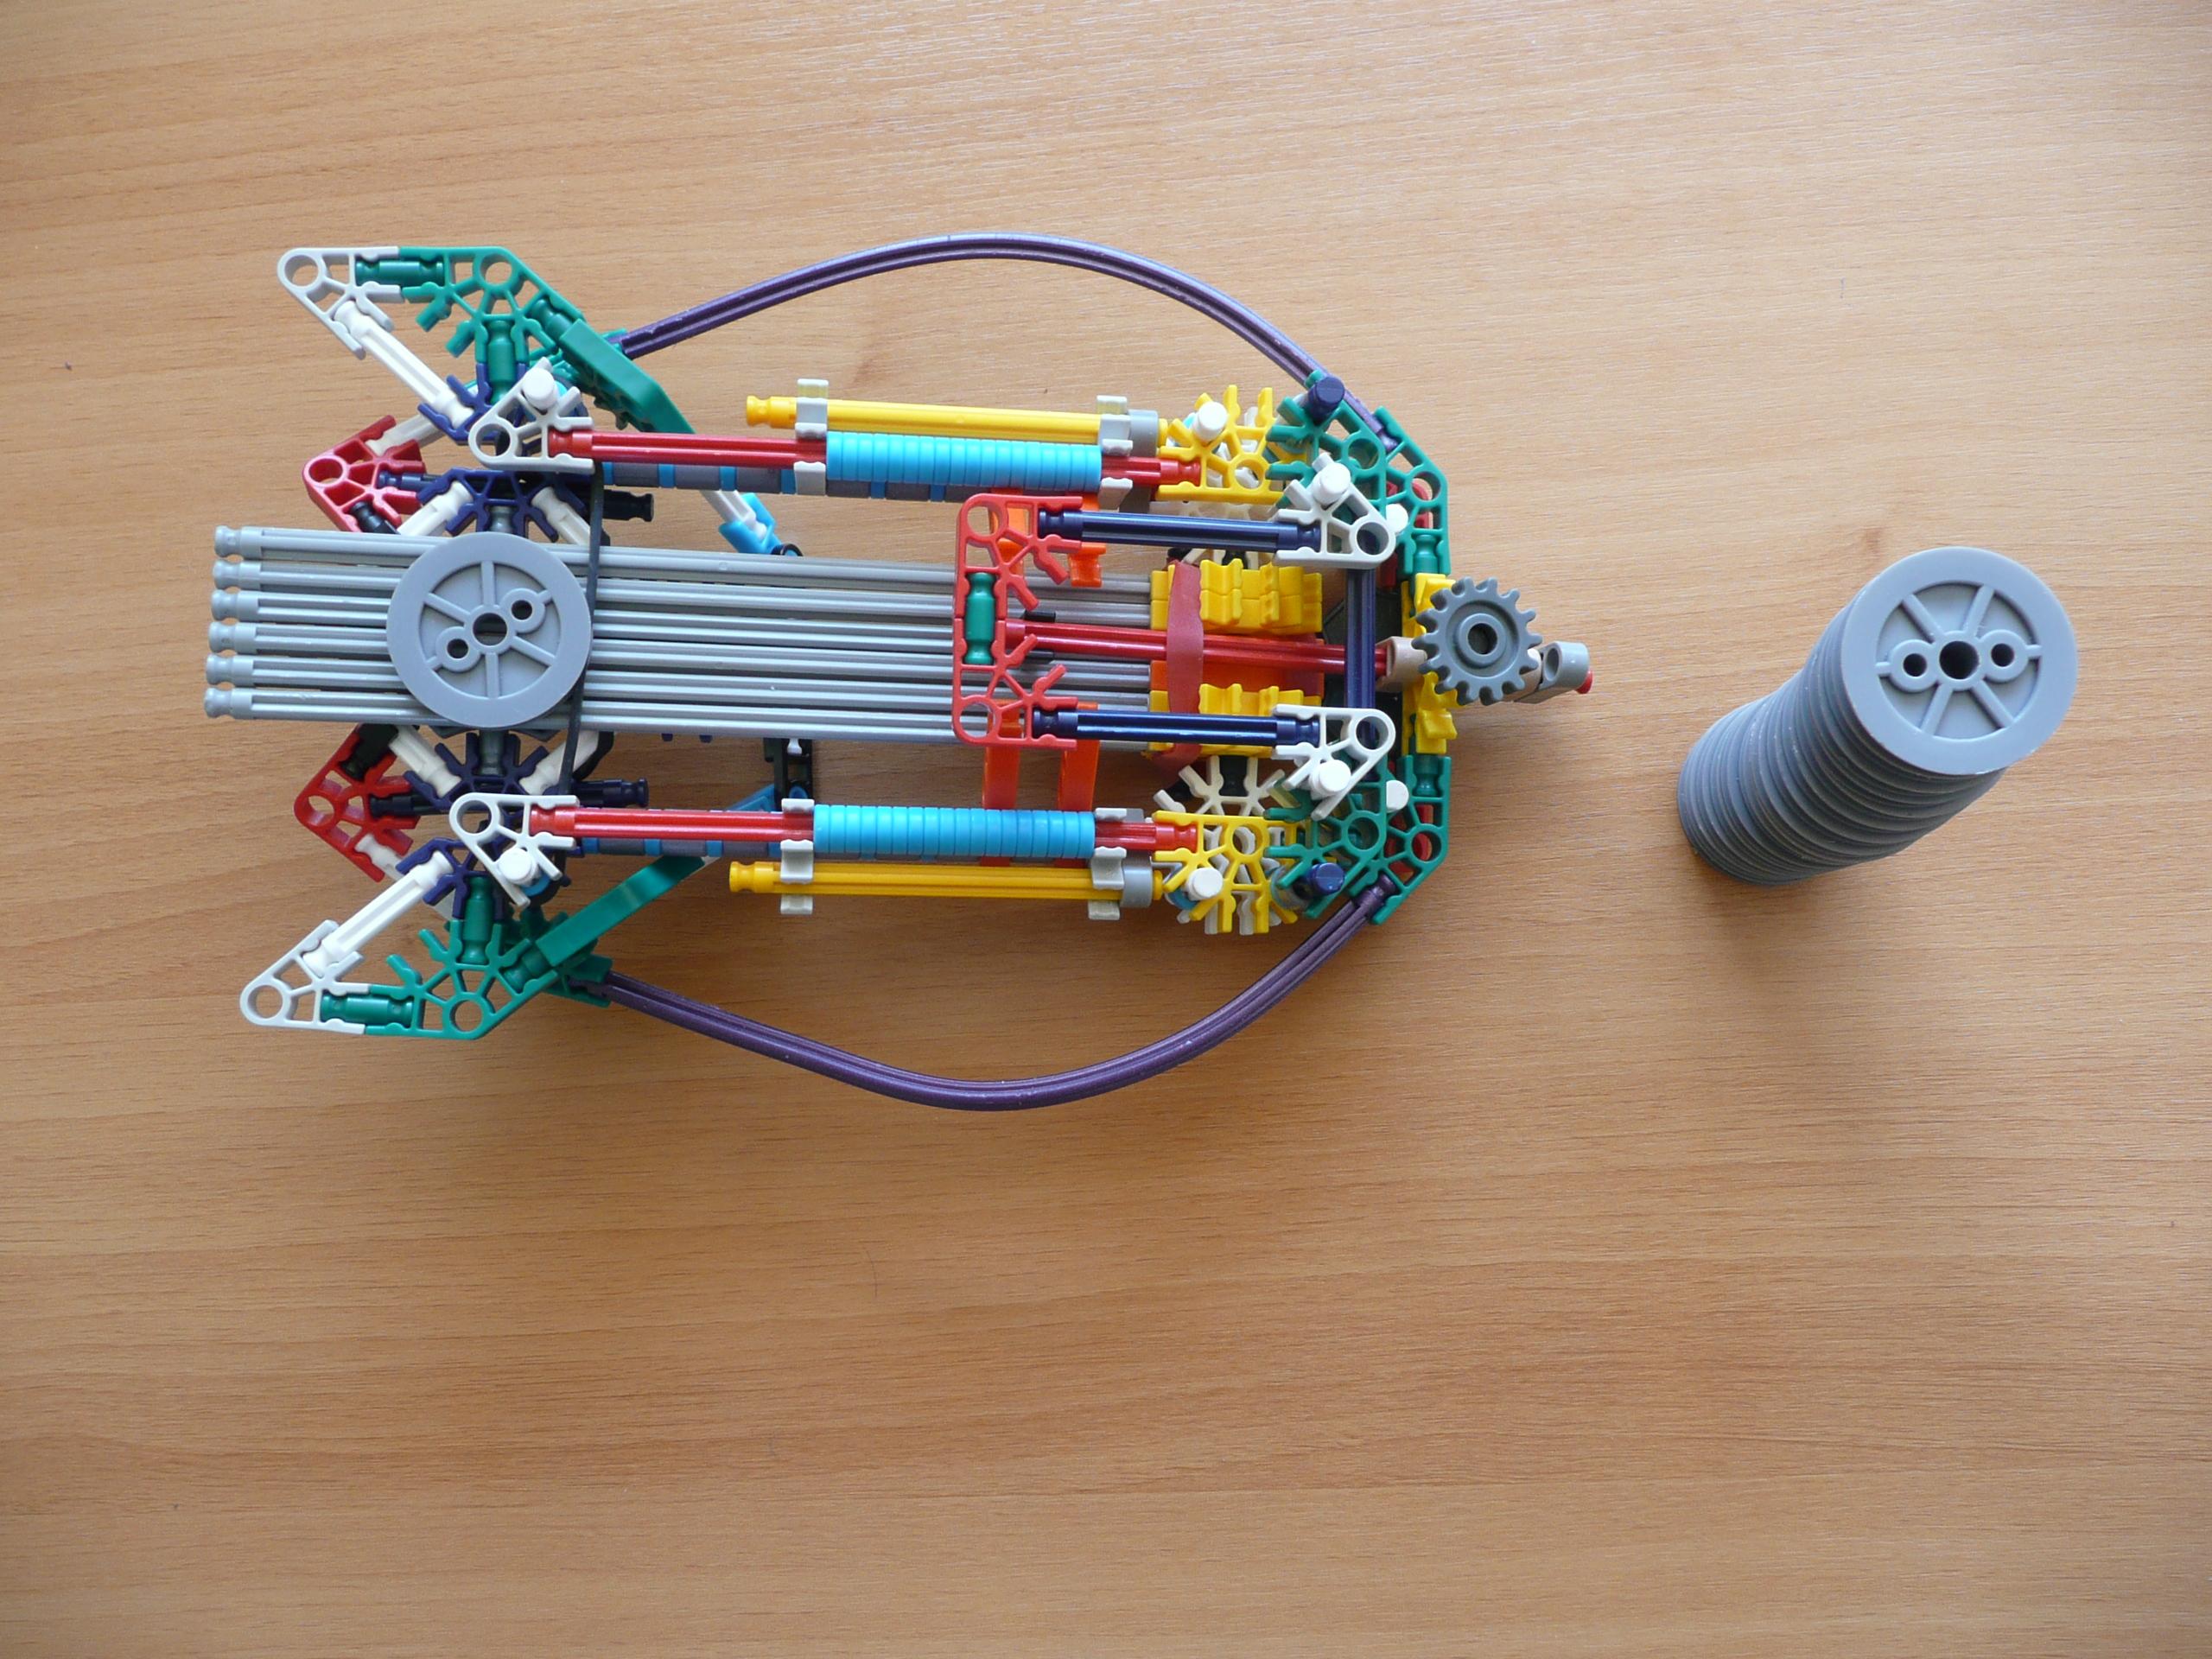 K'nex Wheel Launcher